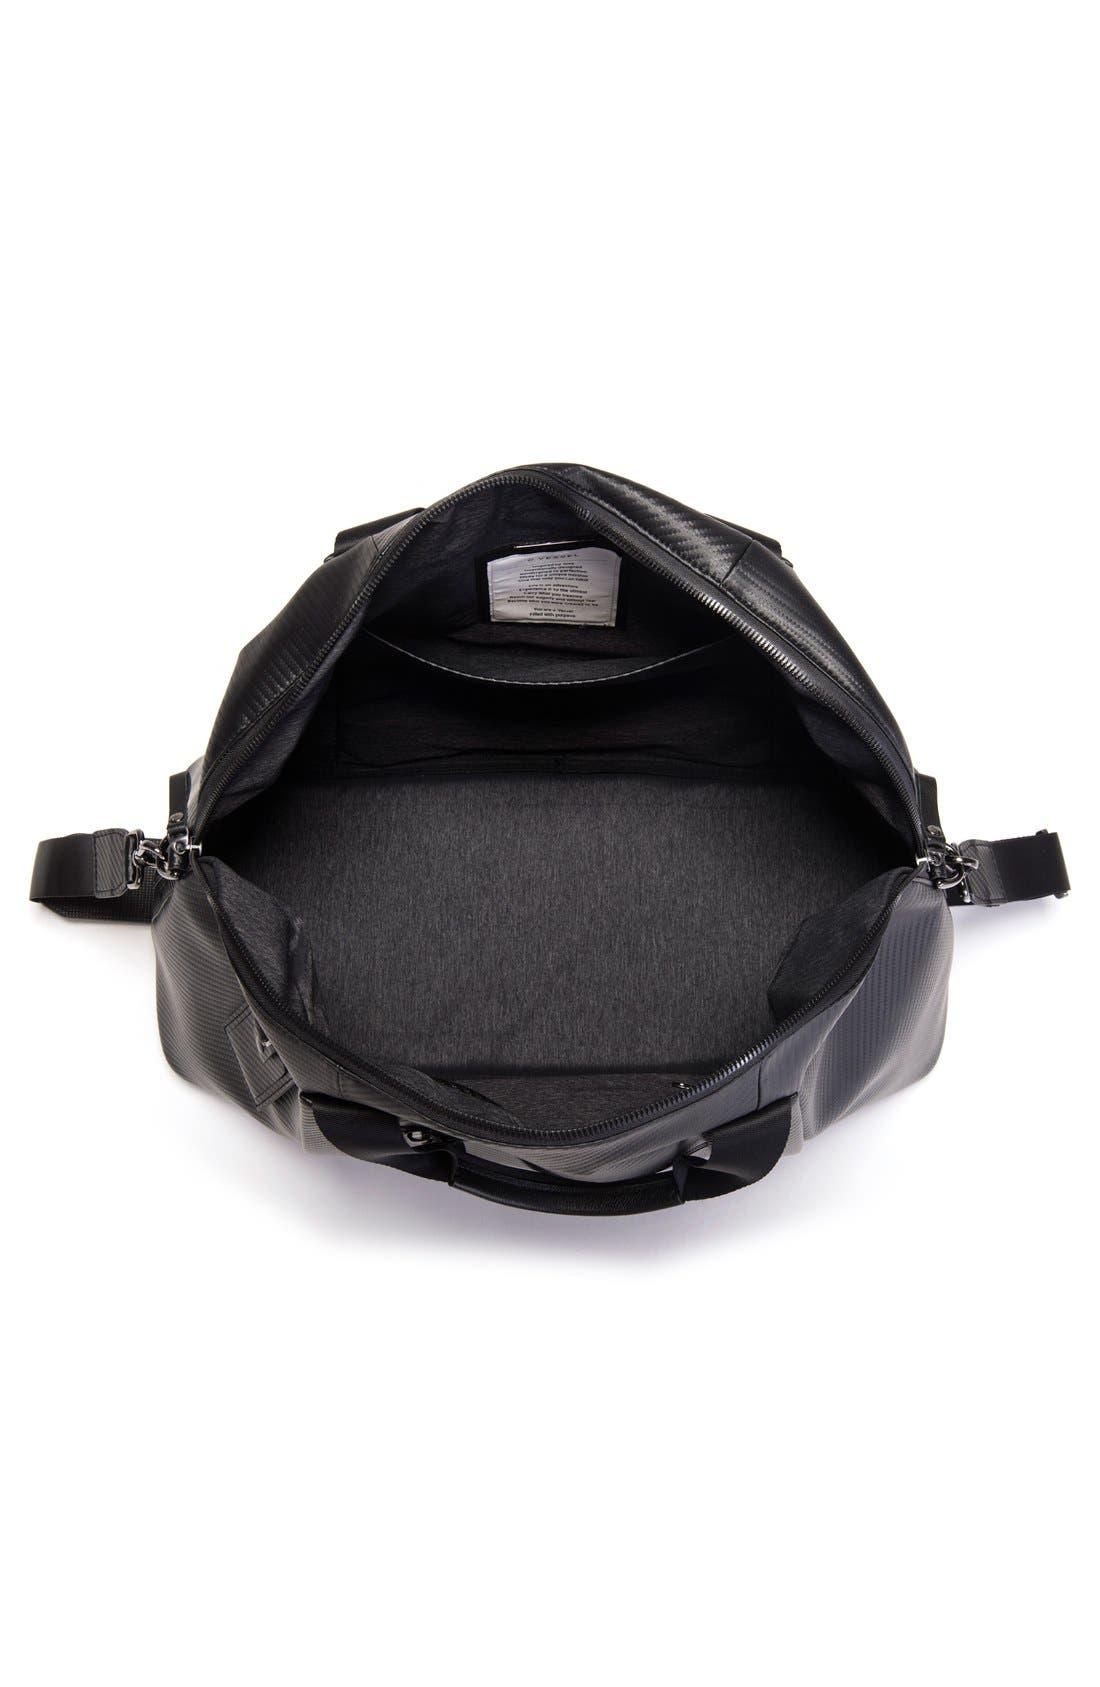 'Signature' Large Duffel Bag,                             Alternate thumbnail 4, color,                             CARBON BLACK